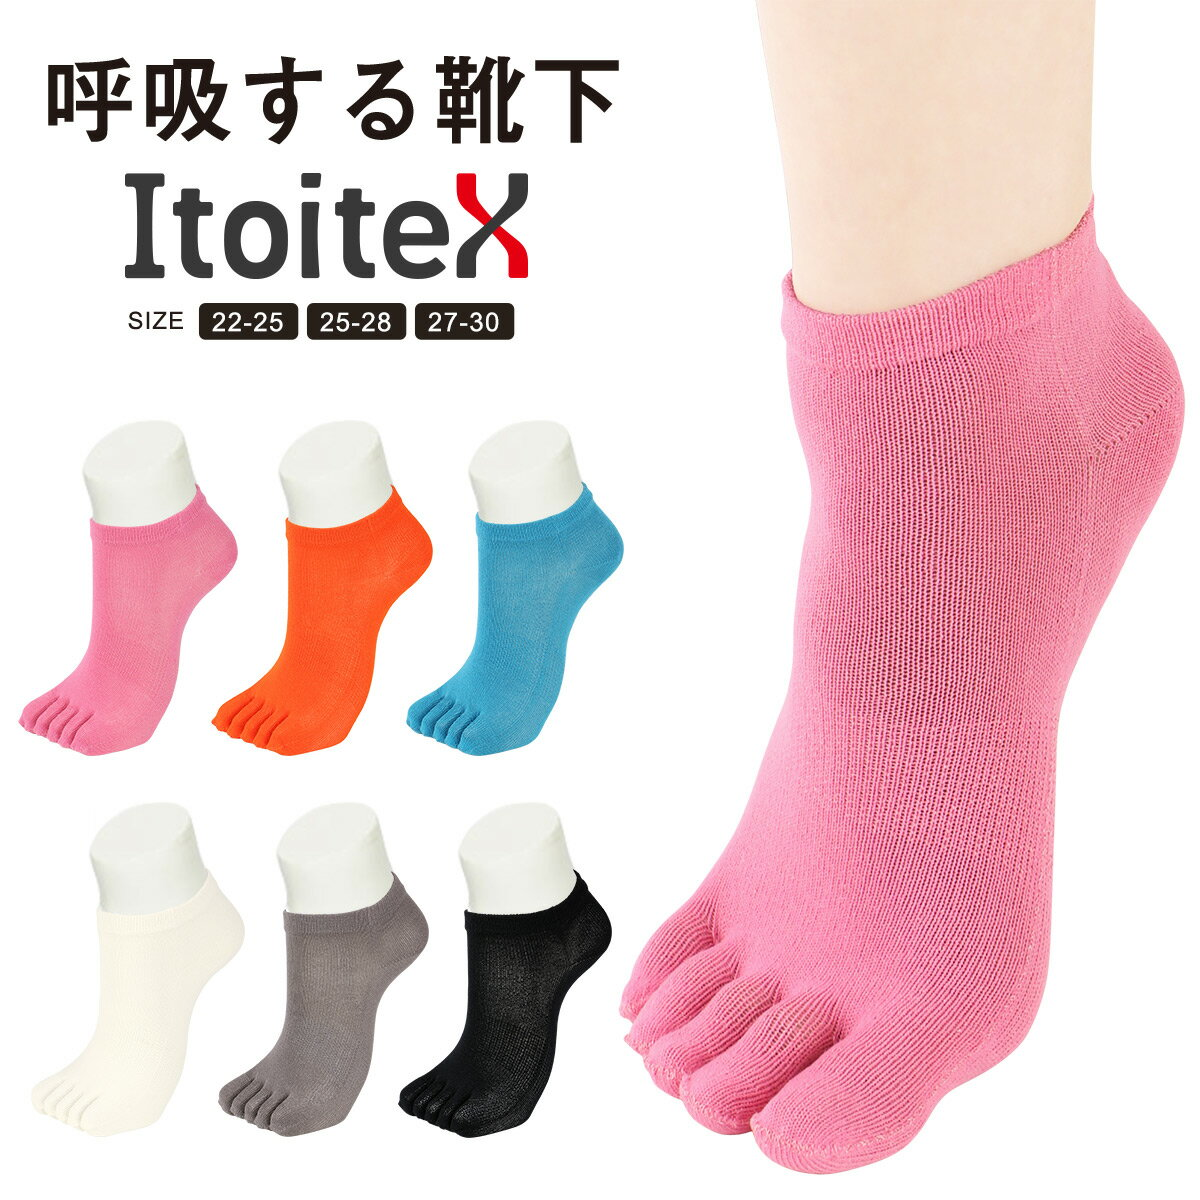 Itoitex (イトイテックス) ランニングソックス 5本指 ショート 和紙×シルク ランニングソックス 靴下 マラソン トレイルランニング 男性 メンズ プレゼント 贈答 ギフト2945-501ポイント10倍